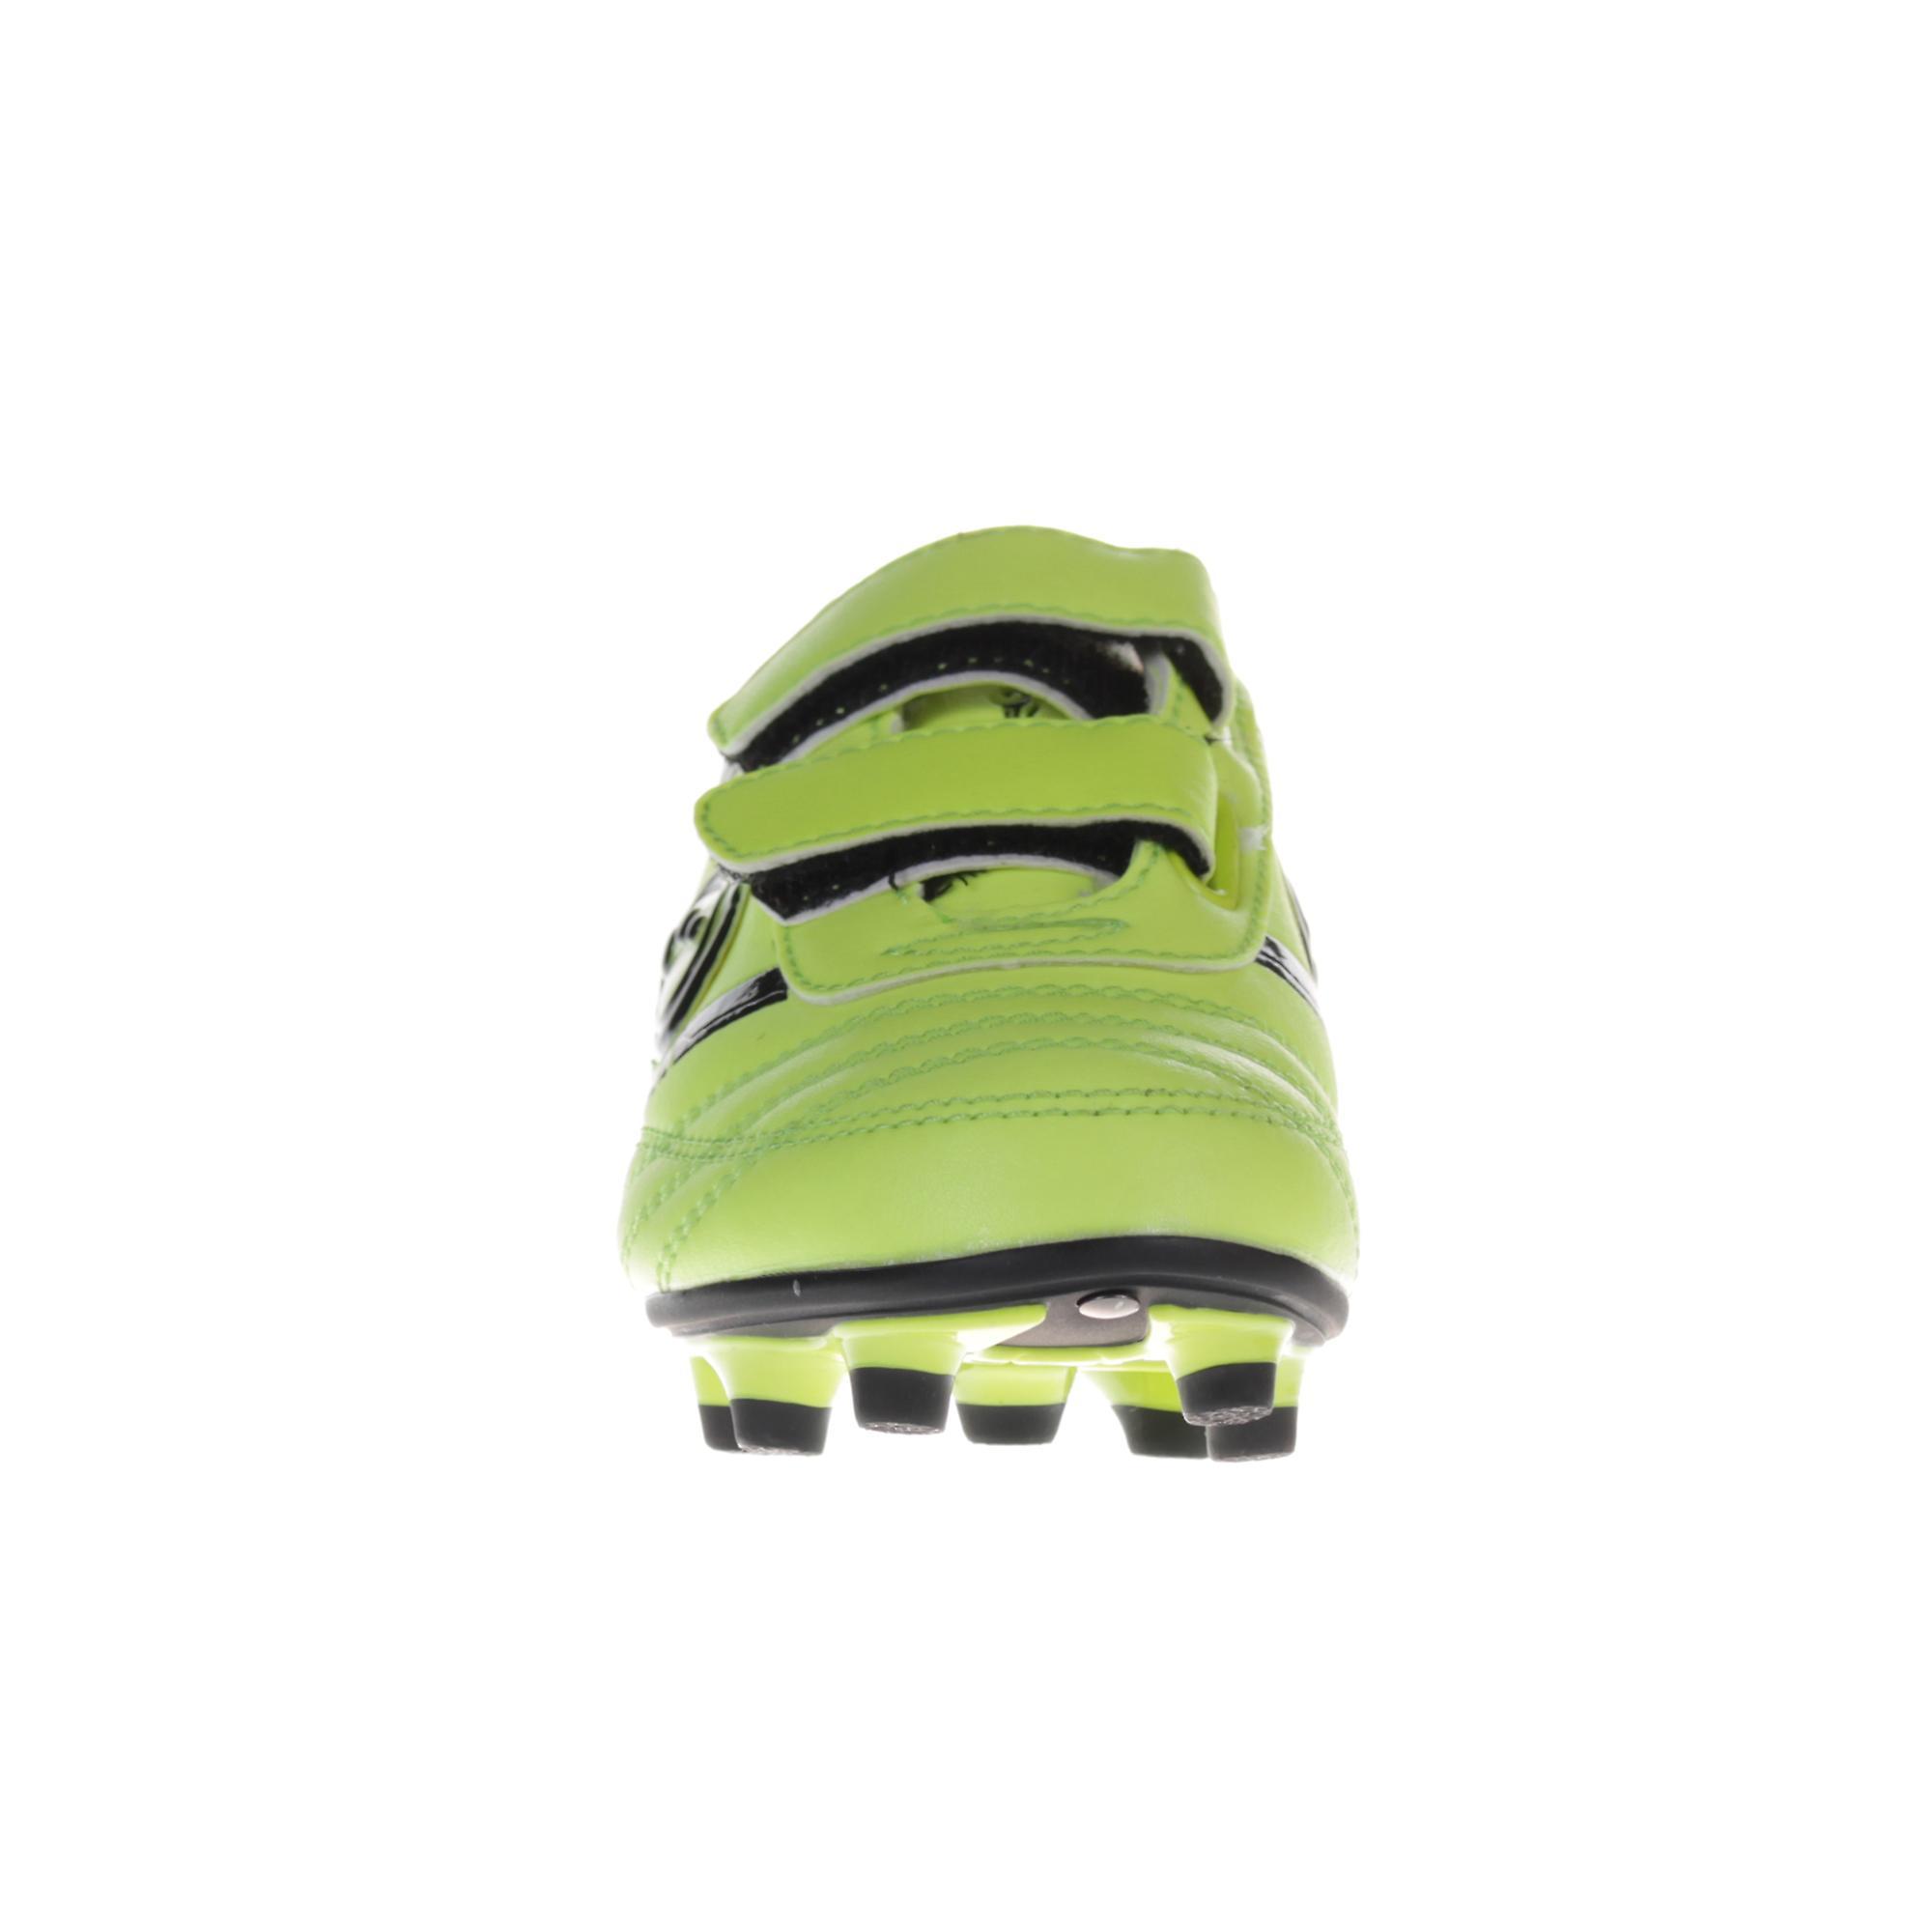 Optimum Tribal Strap Moulded Kids Football Boot Yellow/Black